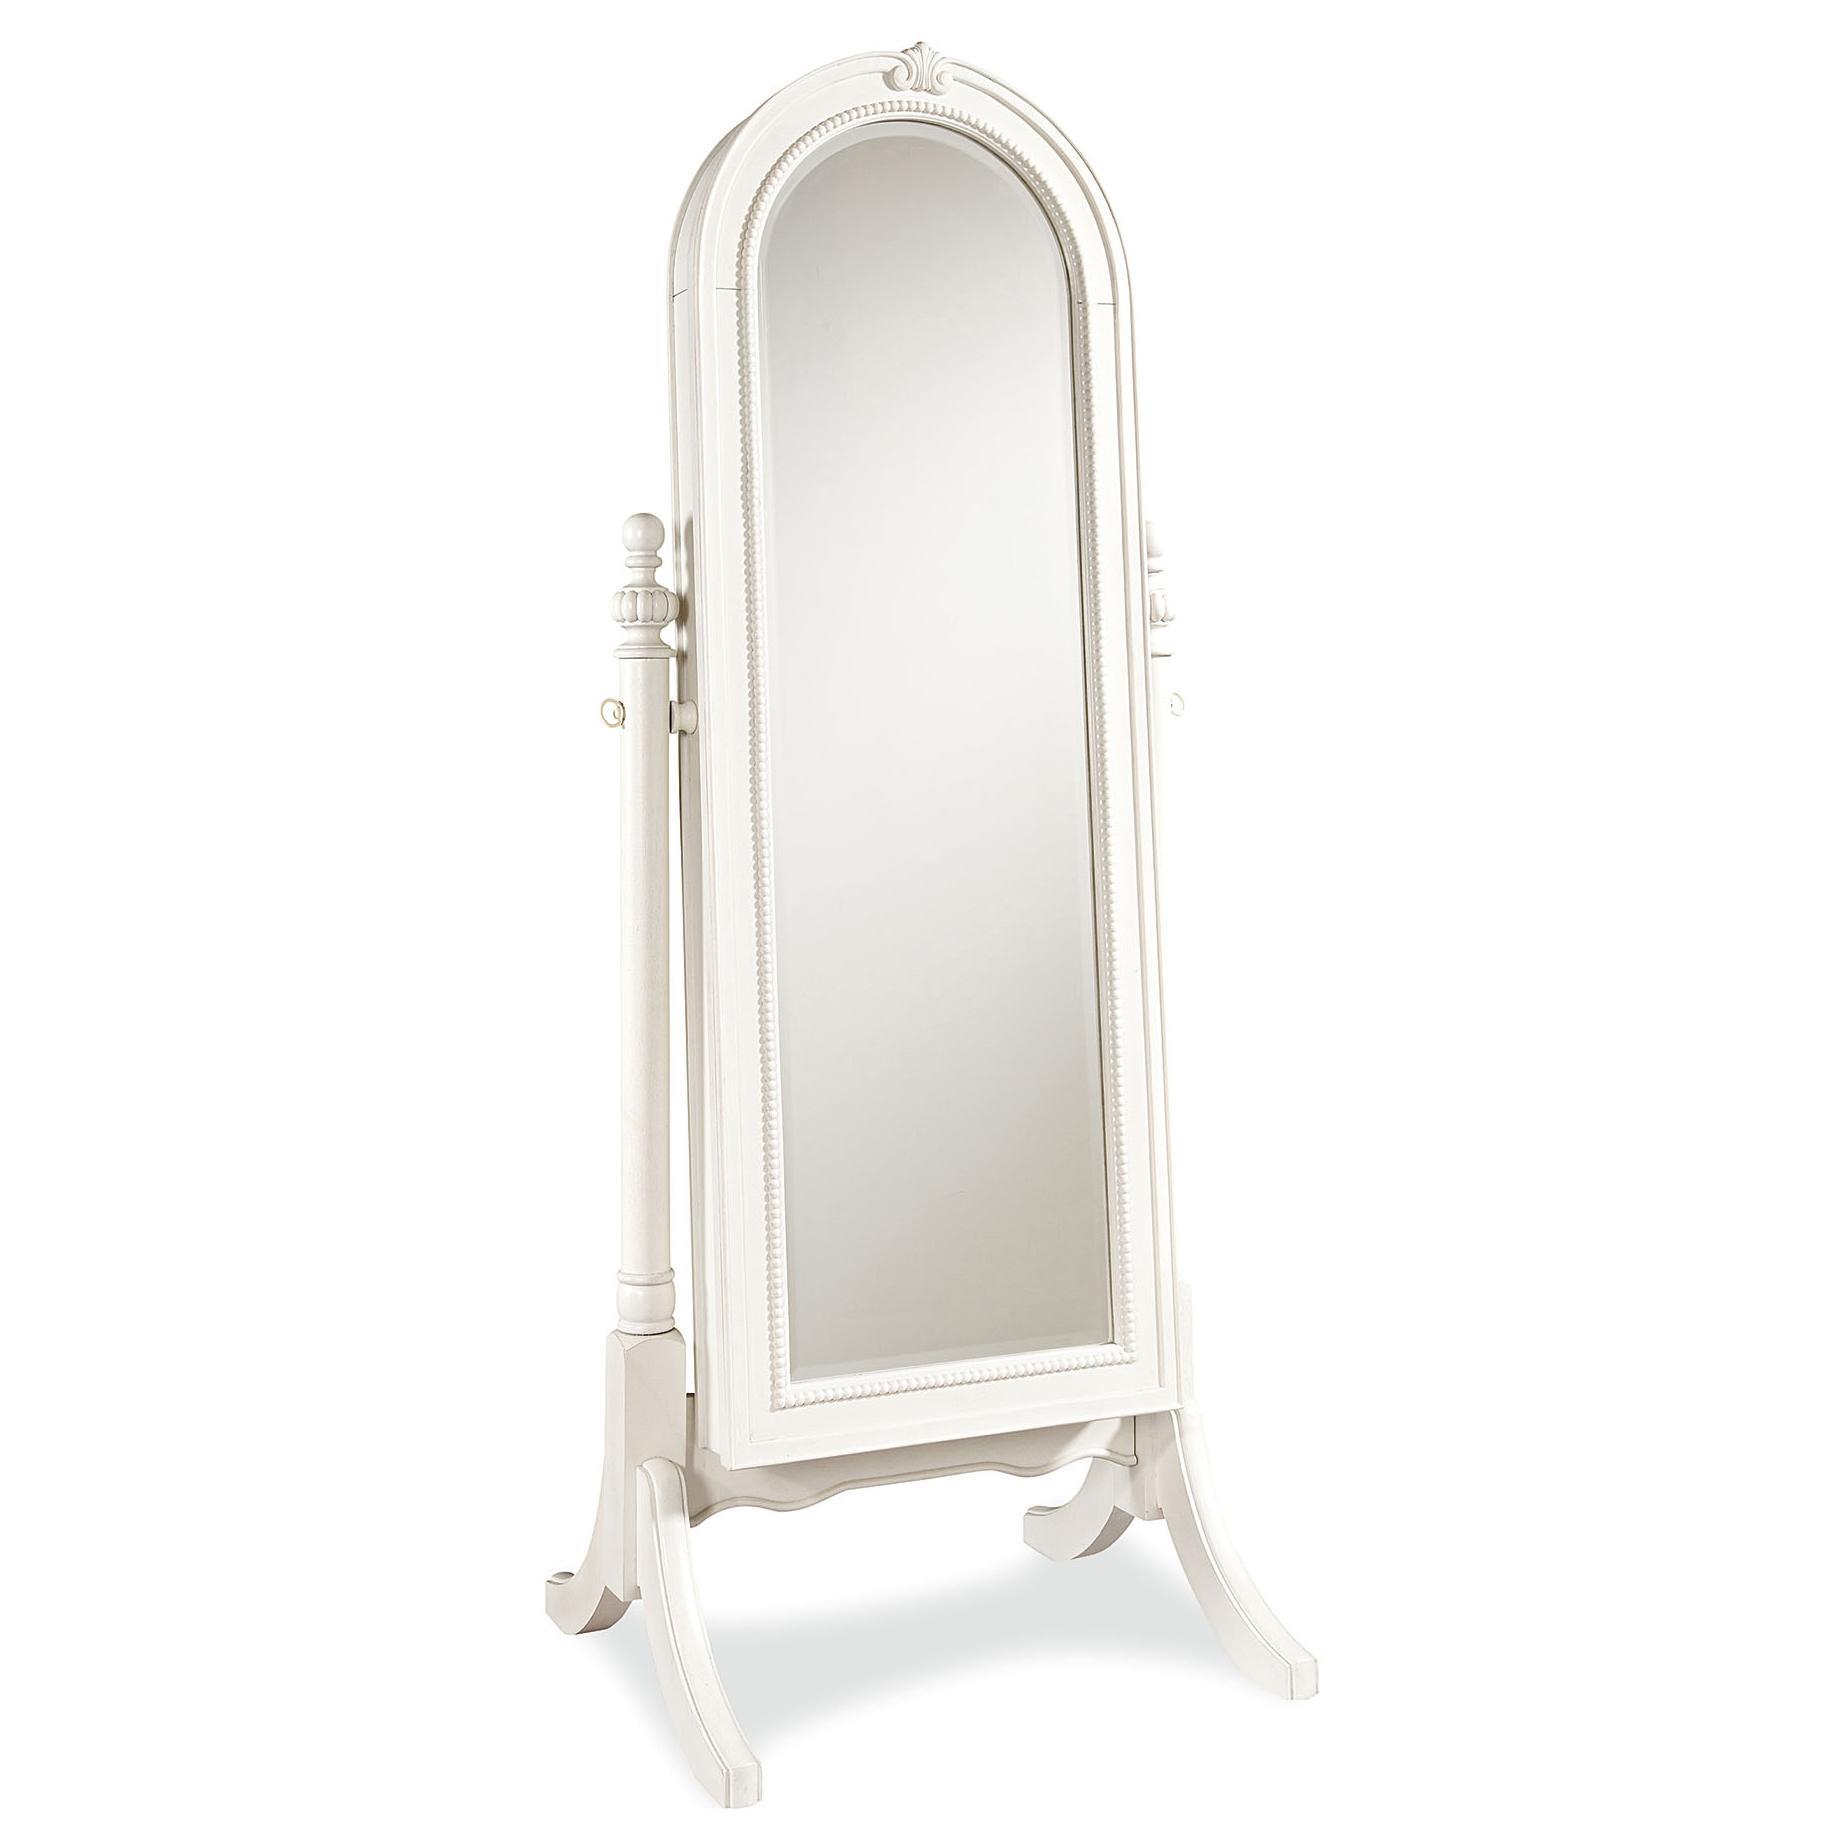 Smartstuff Bellamy Cheval Storage Mirror - Item Number: 330A034